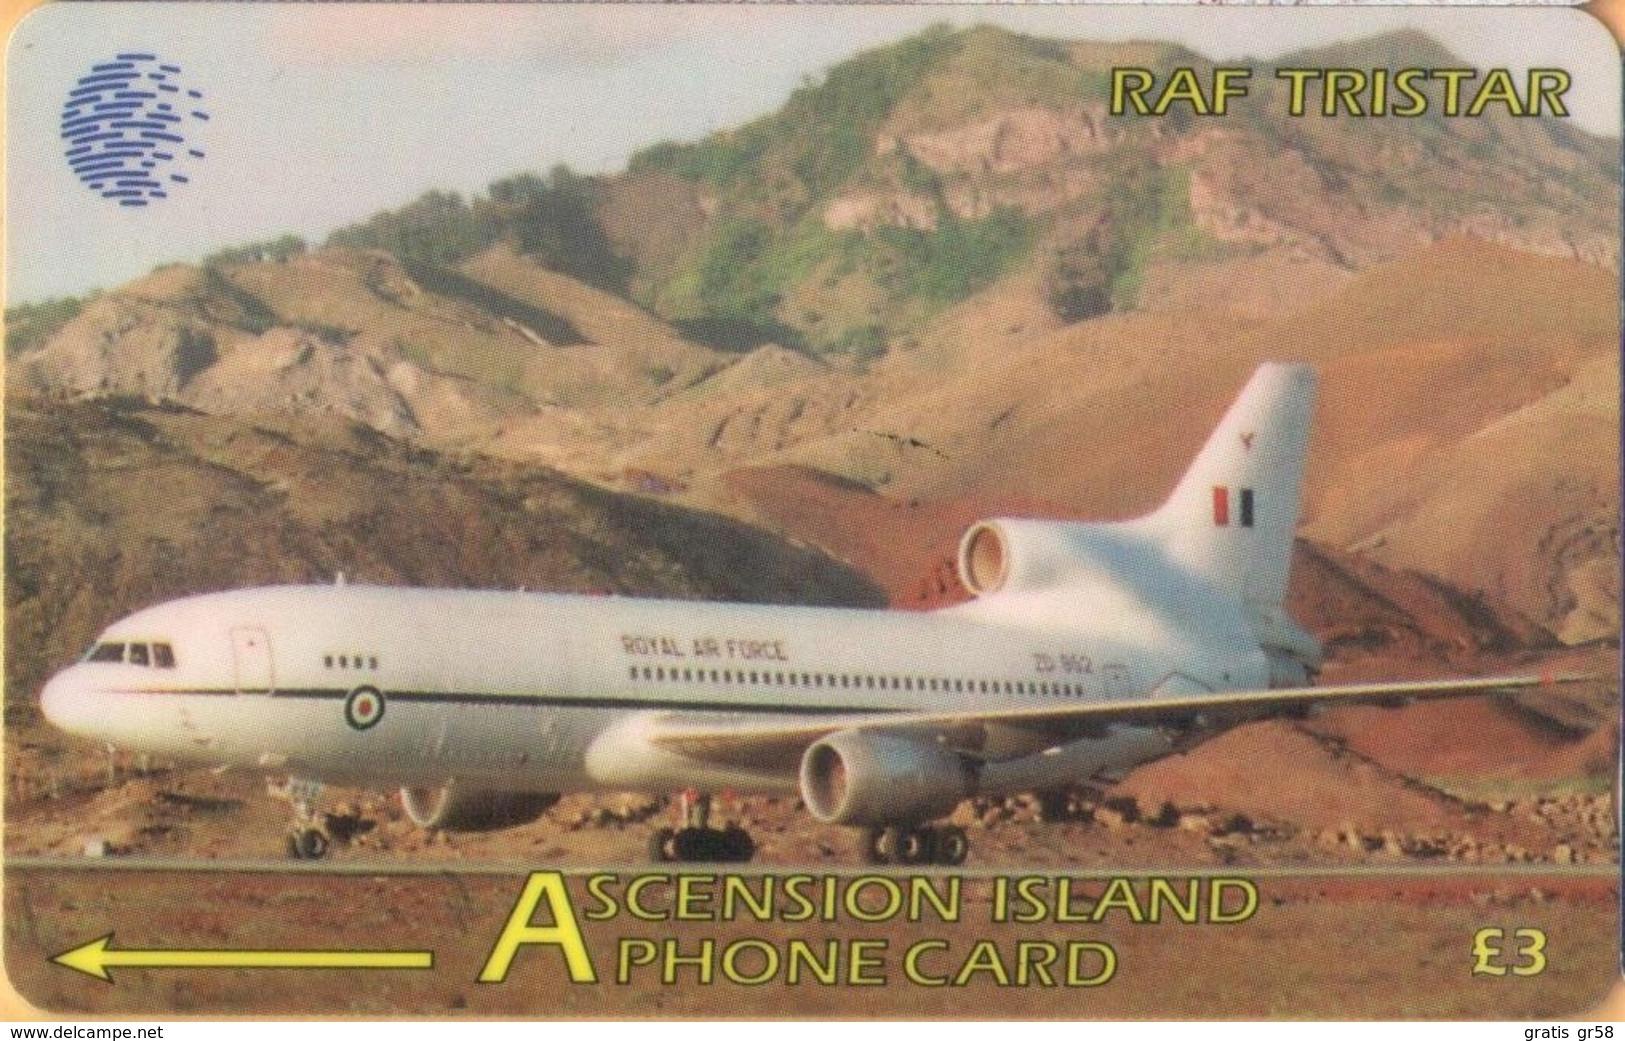 Ascension - 265CASA, GPT, RAF Lockheed Tristar, Air Forces, Aircraft, 2000ex, 1998, Used - Islas Ascensión